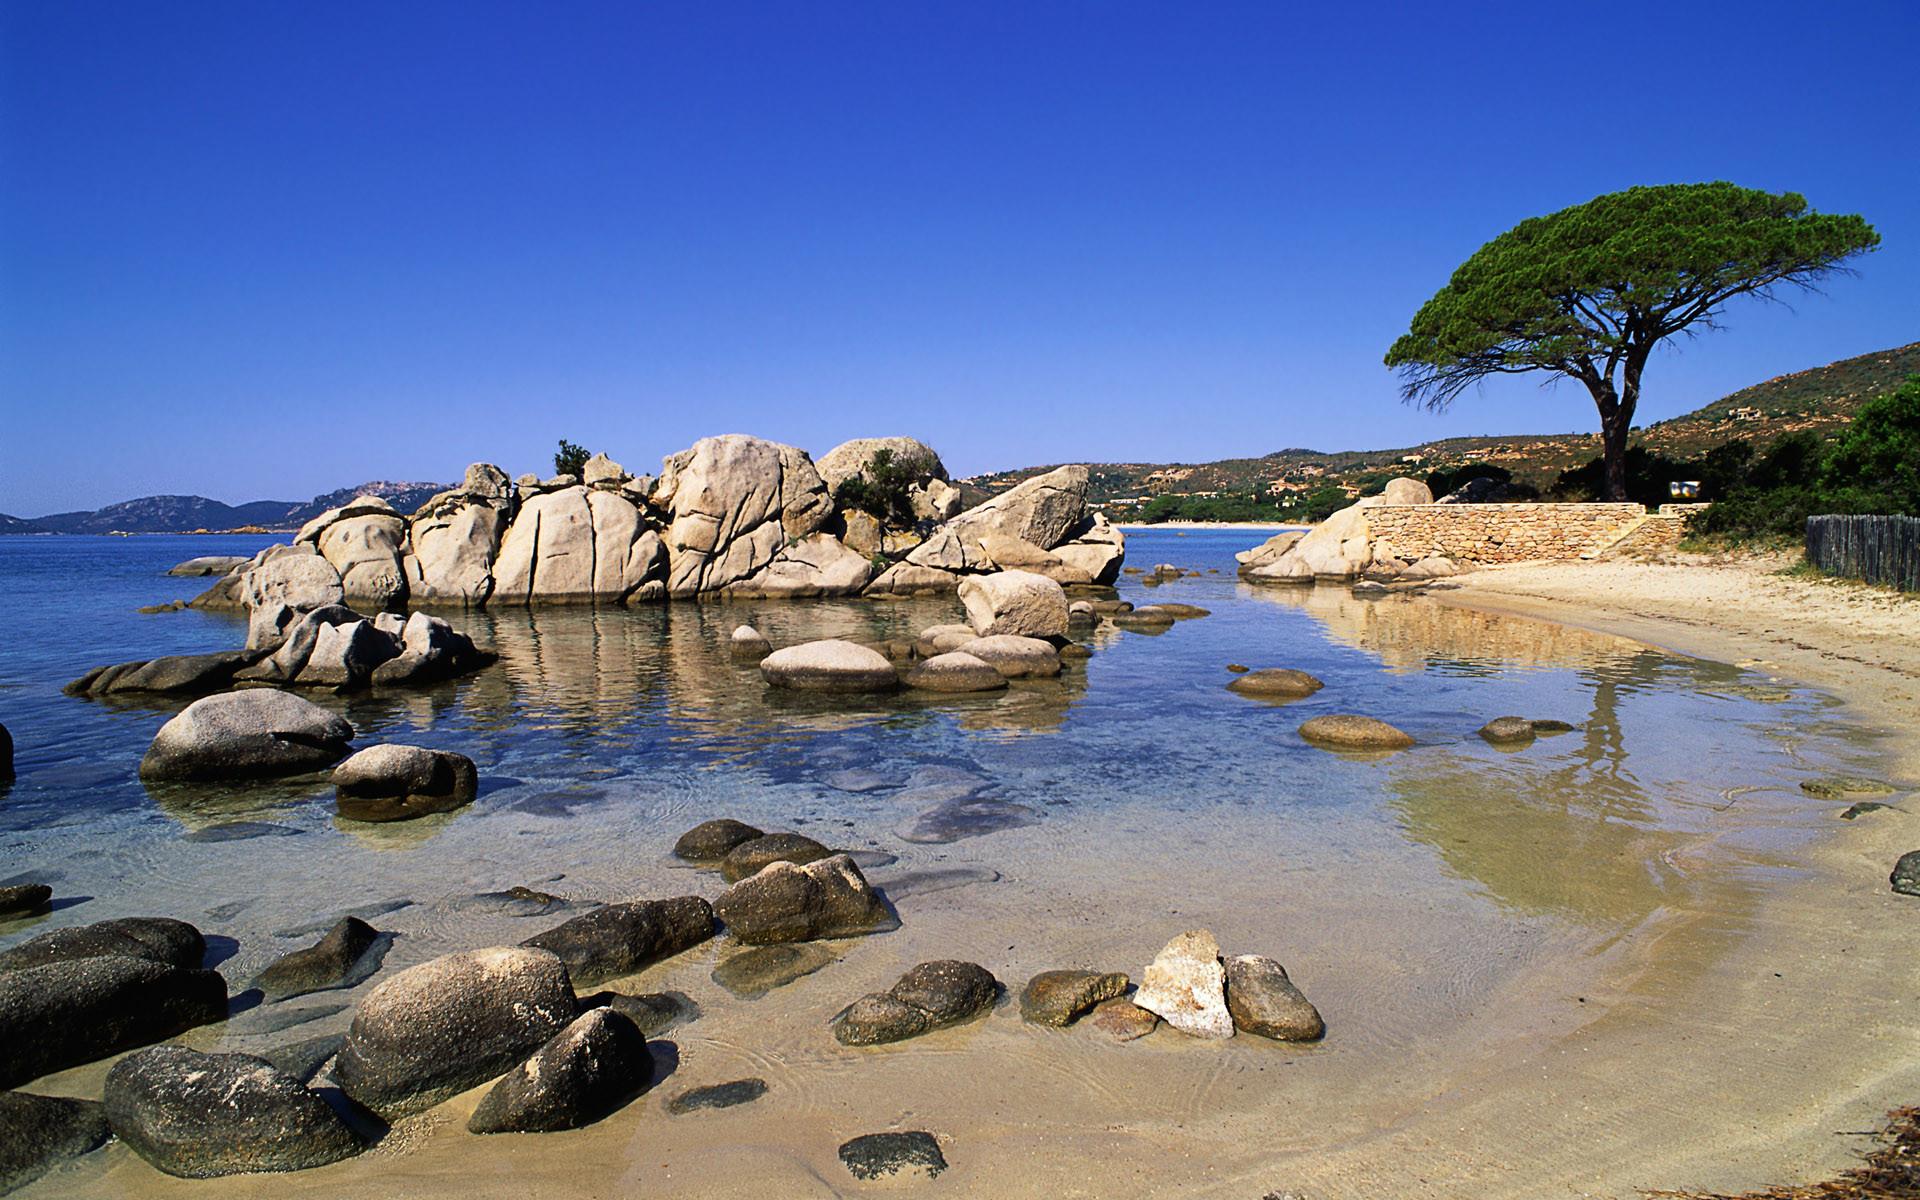 Desktop hd 3d nature images download. Palombaggia Beach